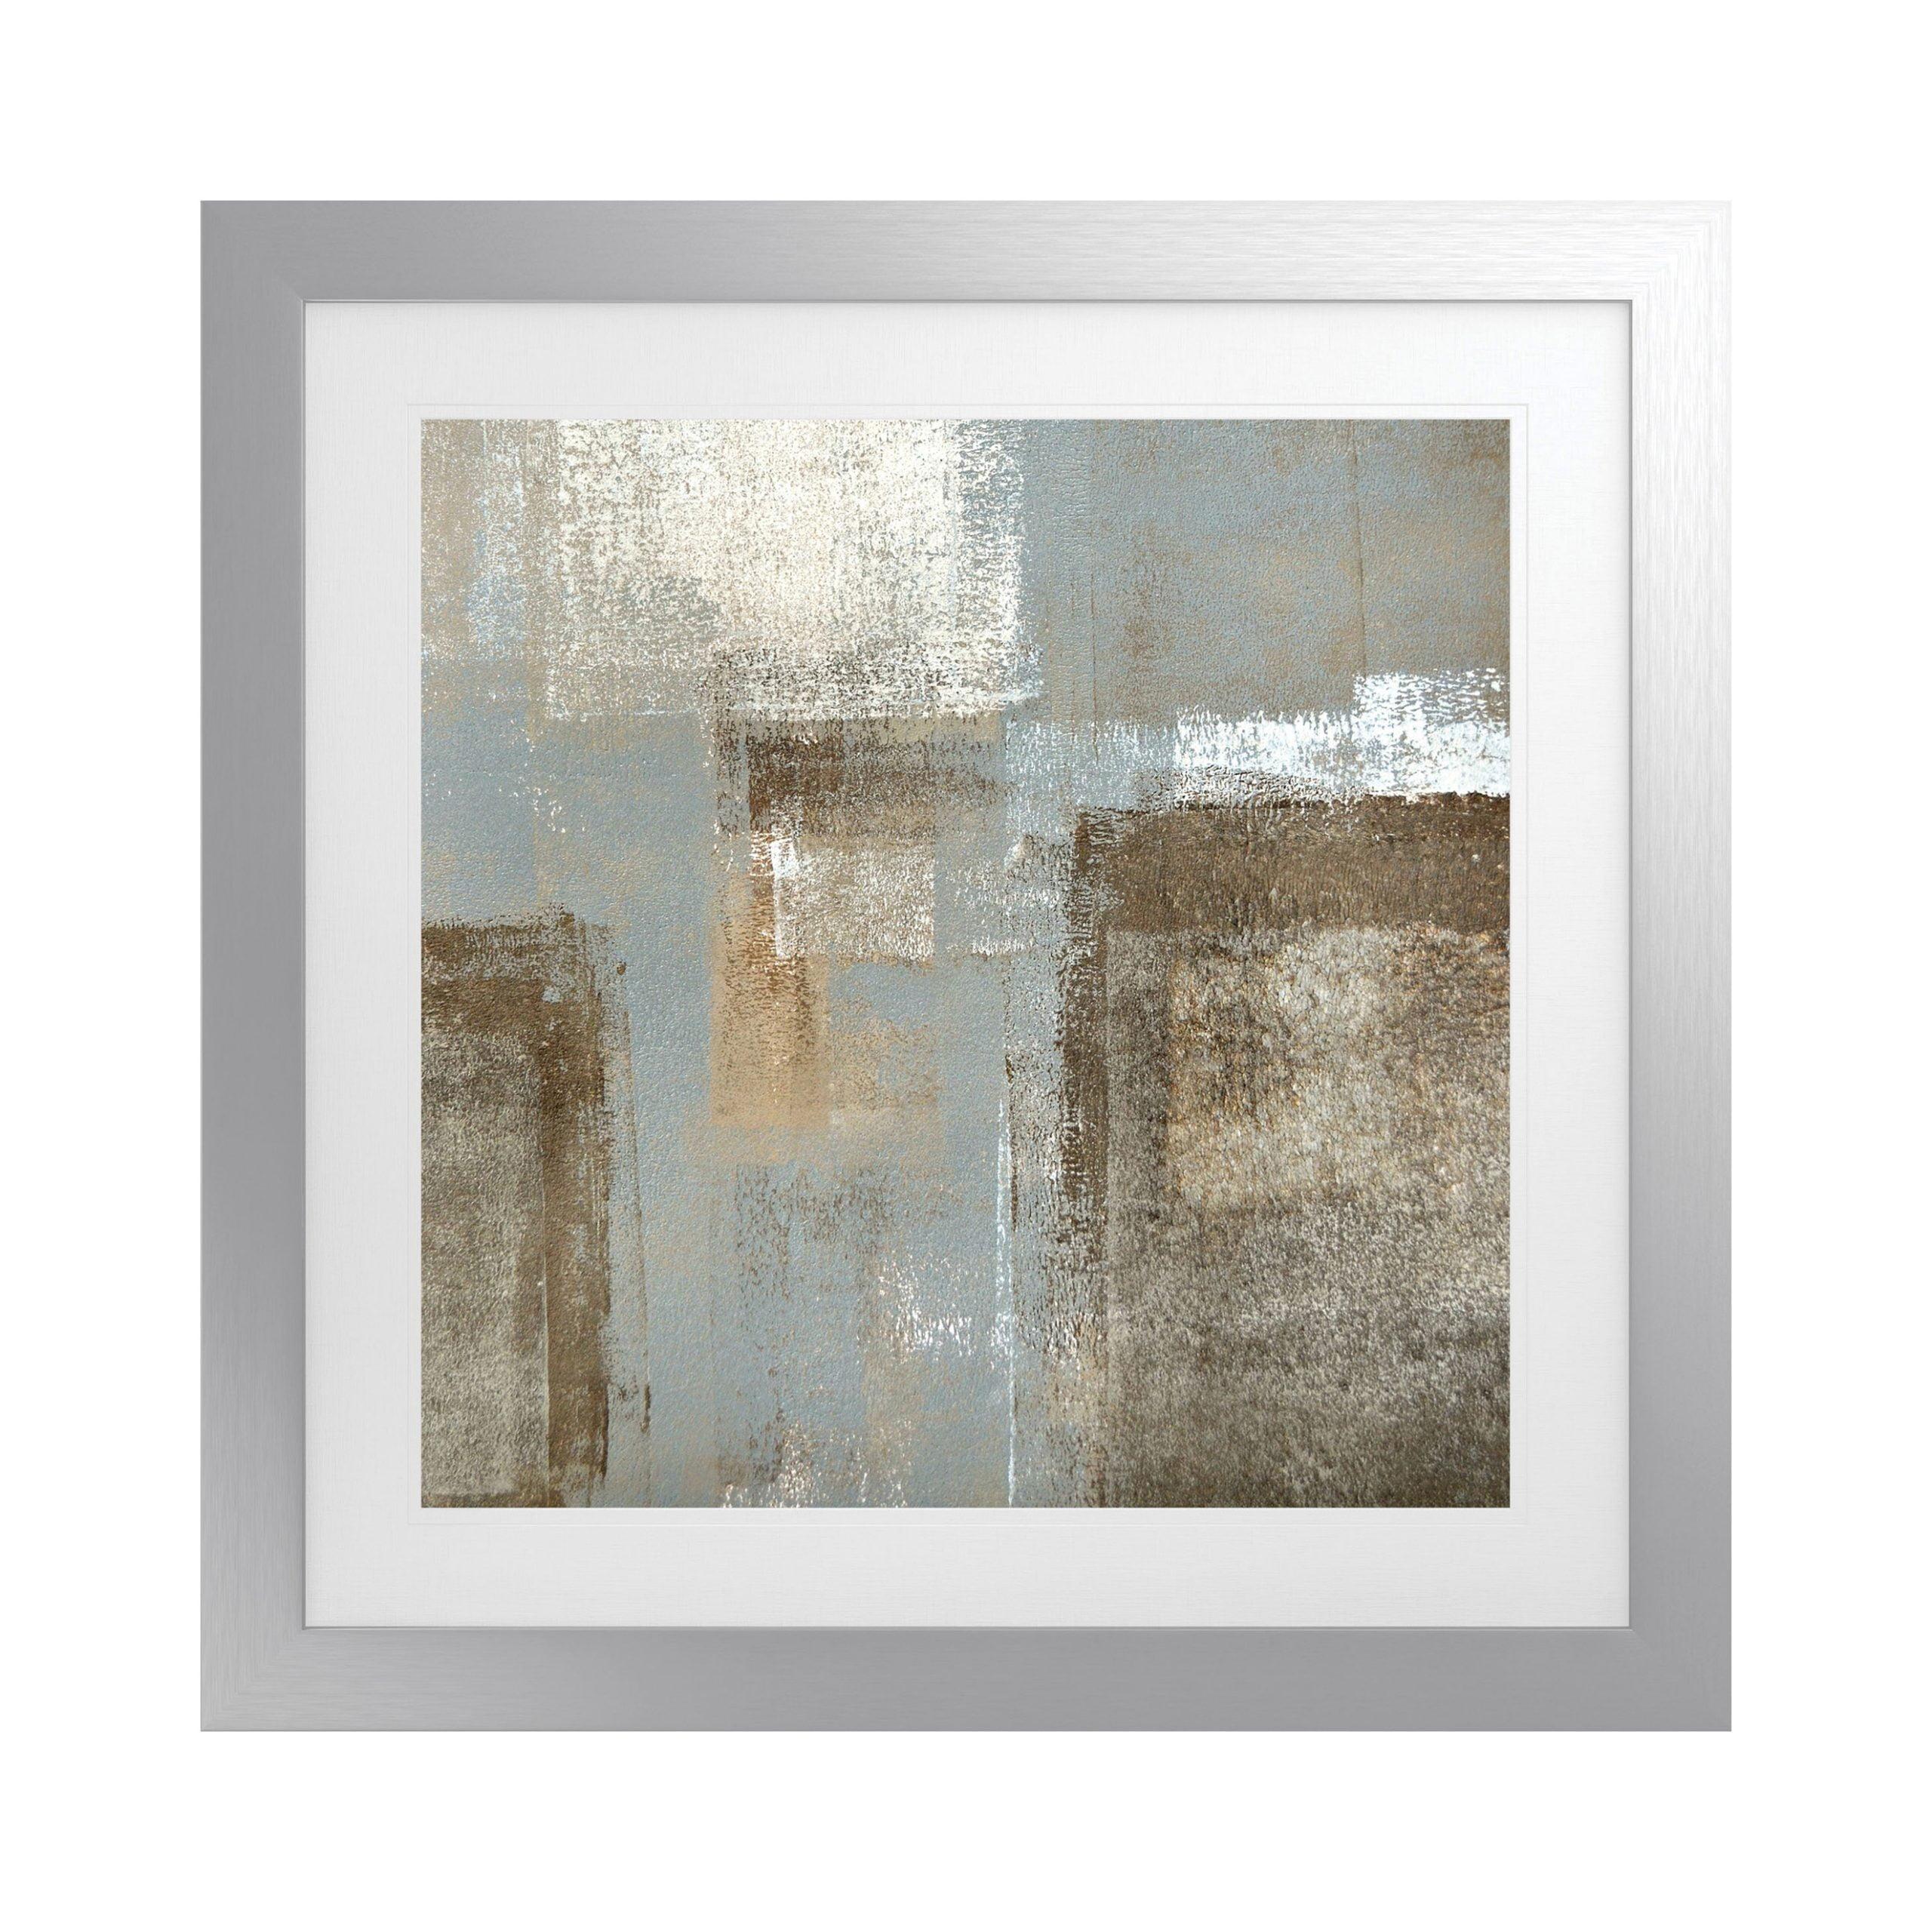 Haze Artwork with Fornari Silver Frame